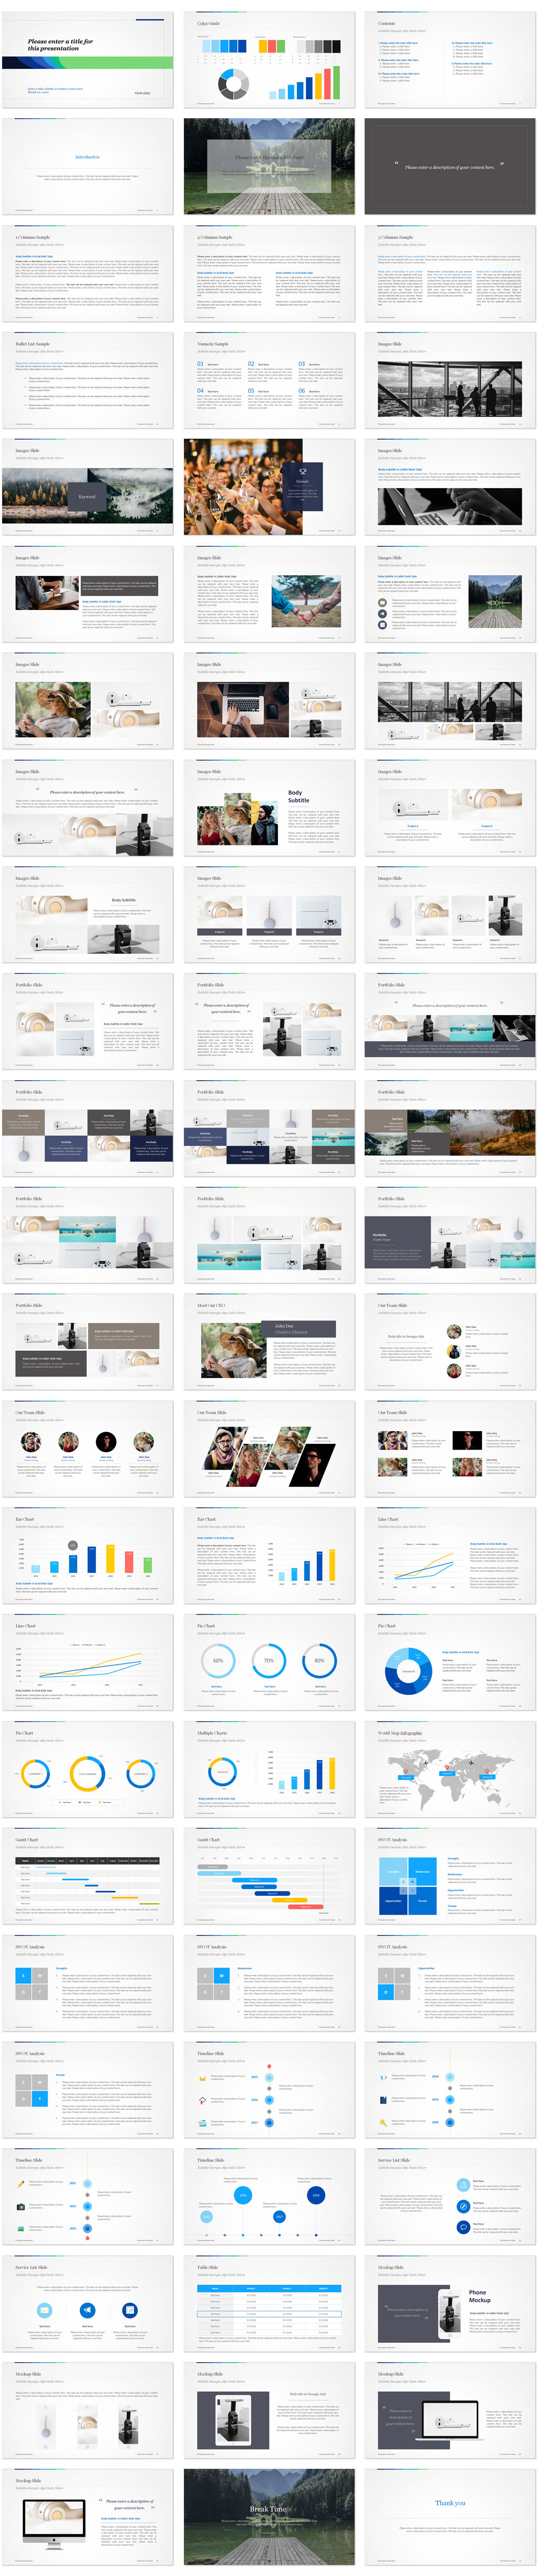 Multipurpose PowerPoint Templates